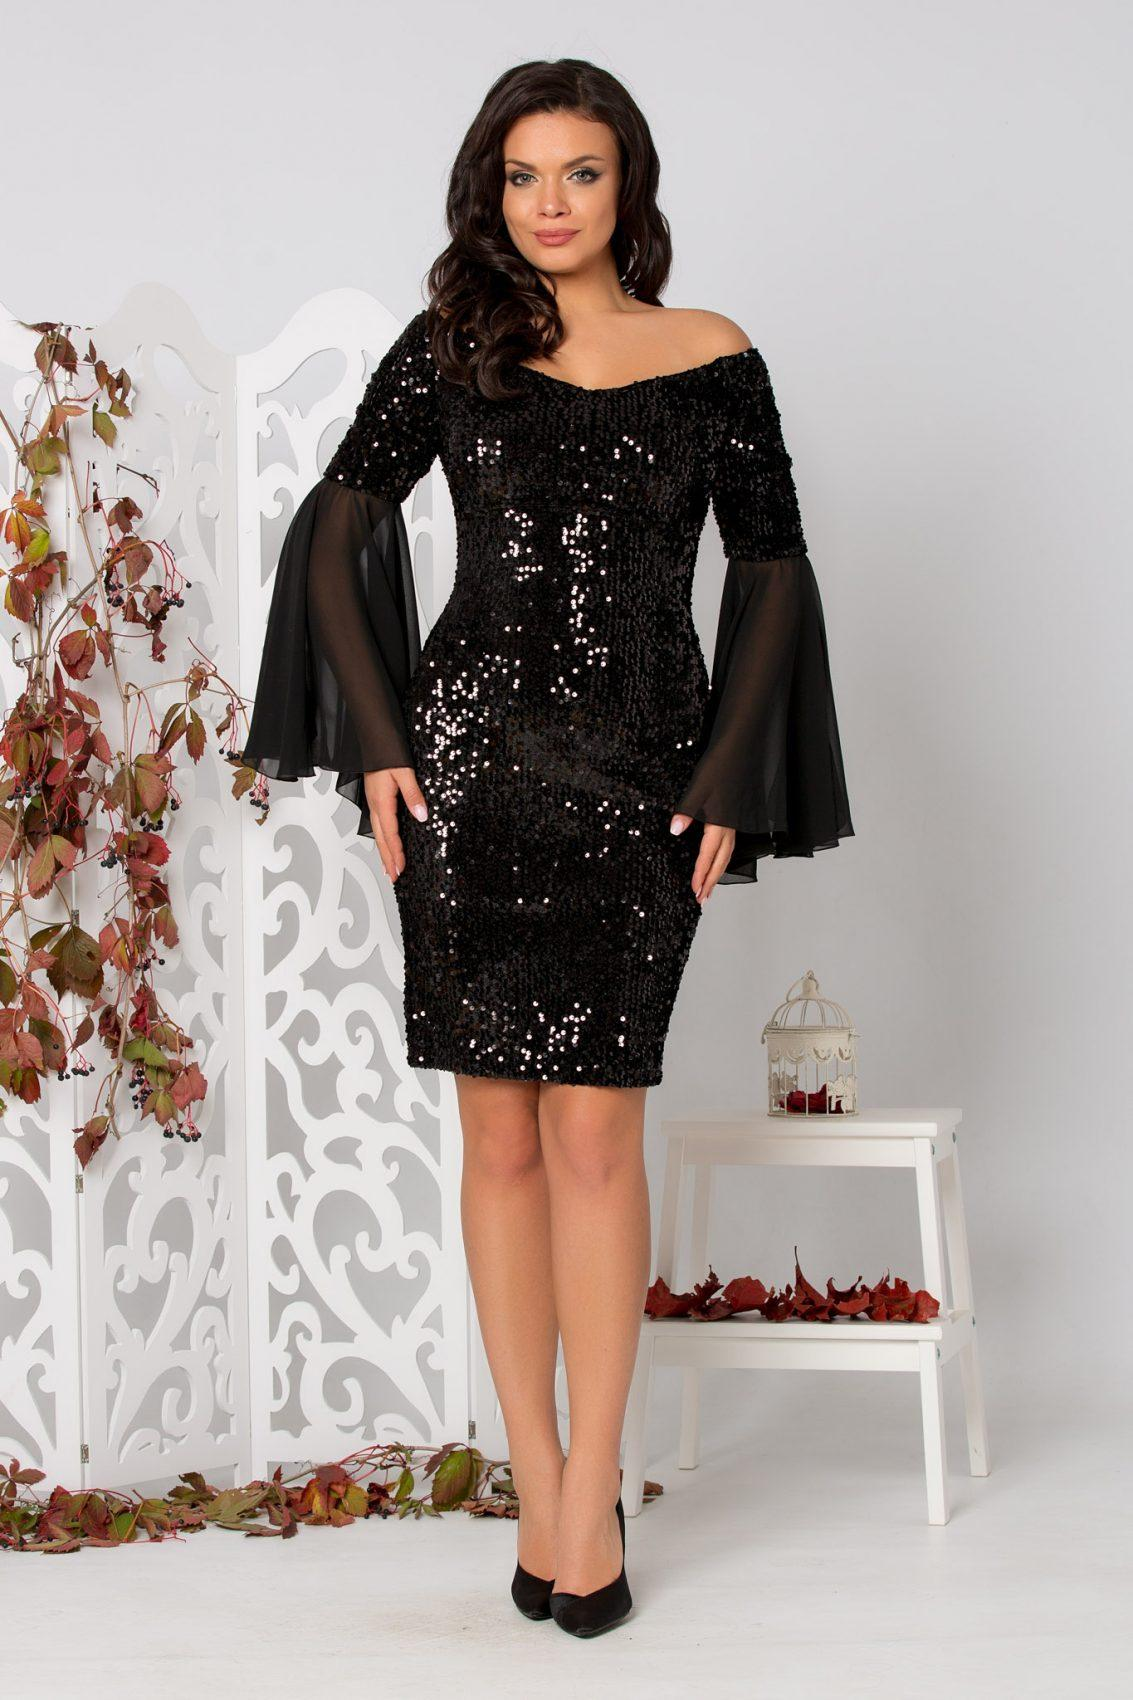 Modena Black Dress